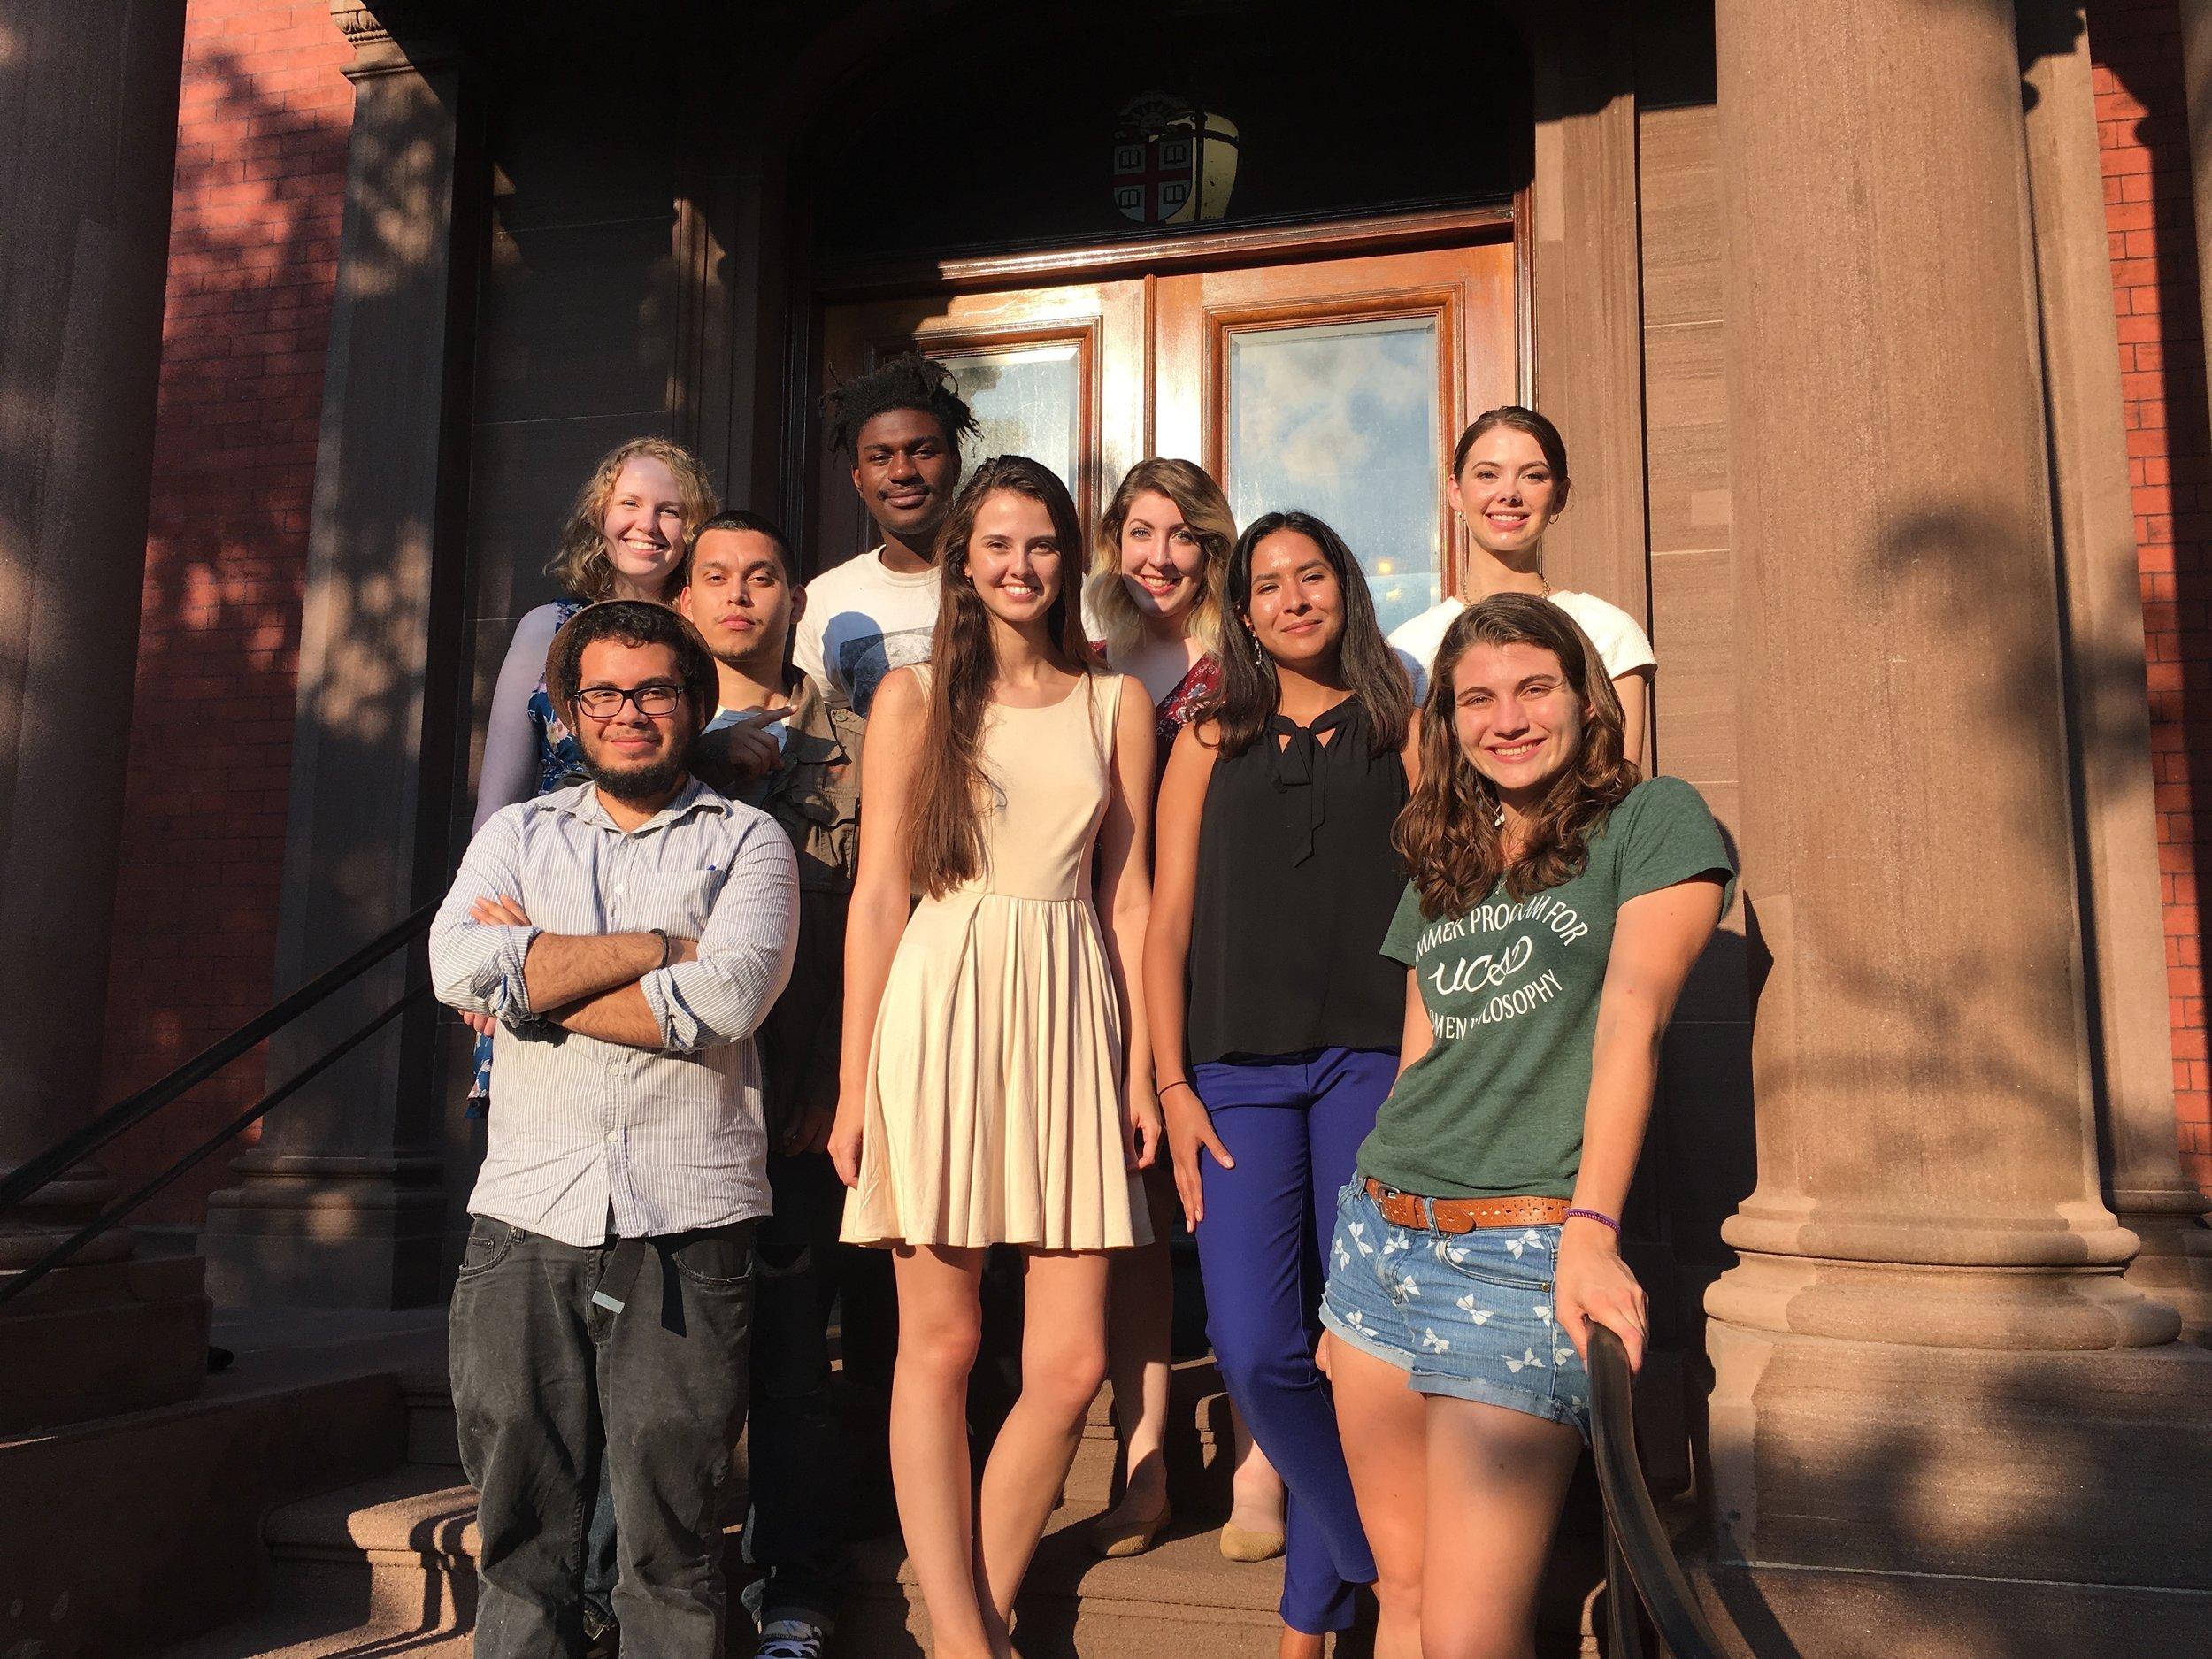 Top row, left to right: Michaela Garneau, Earvin Chavez, Mahmoud Jalloh, Crystal Hernandez, Anna Bates. Bottom row, left to right: Jean Amaya, Lucy Petroucheva, Aurora Llamas, Ariana Peruzzi.